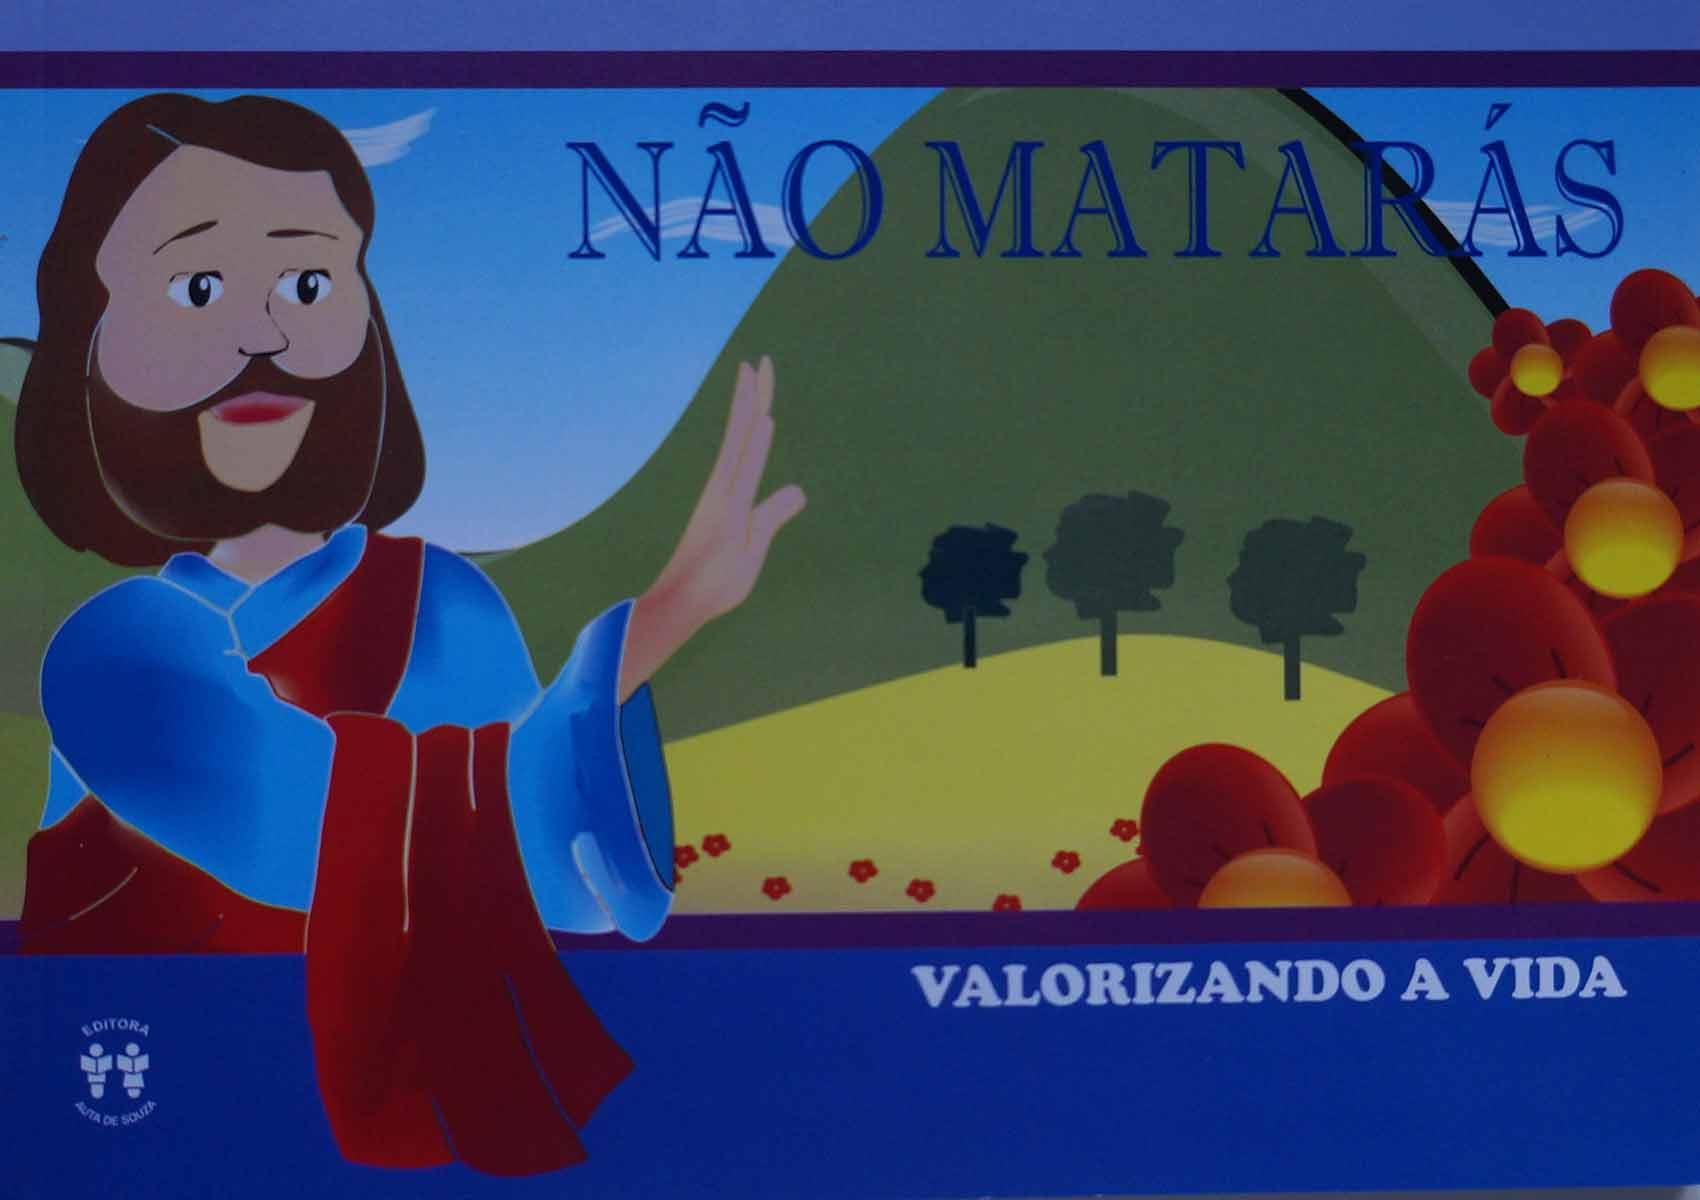 NÃO MATARÁS - VALORIZANDO A VIDA